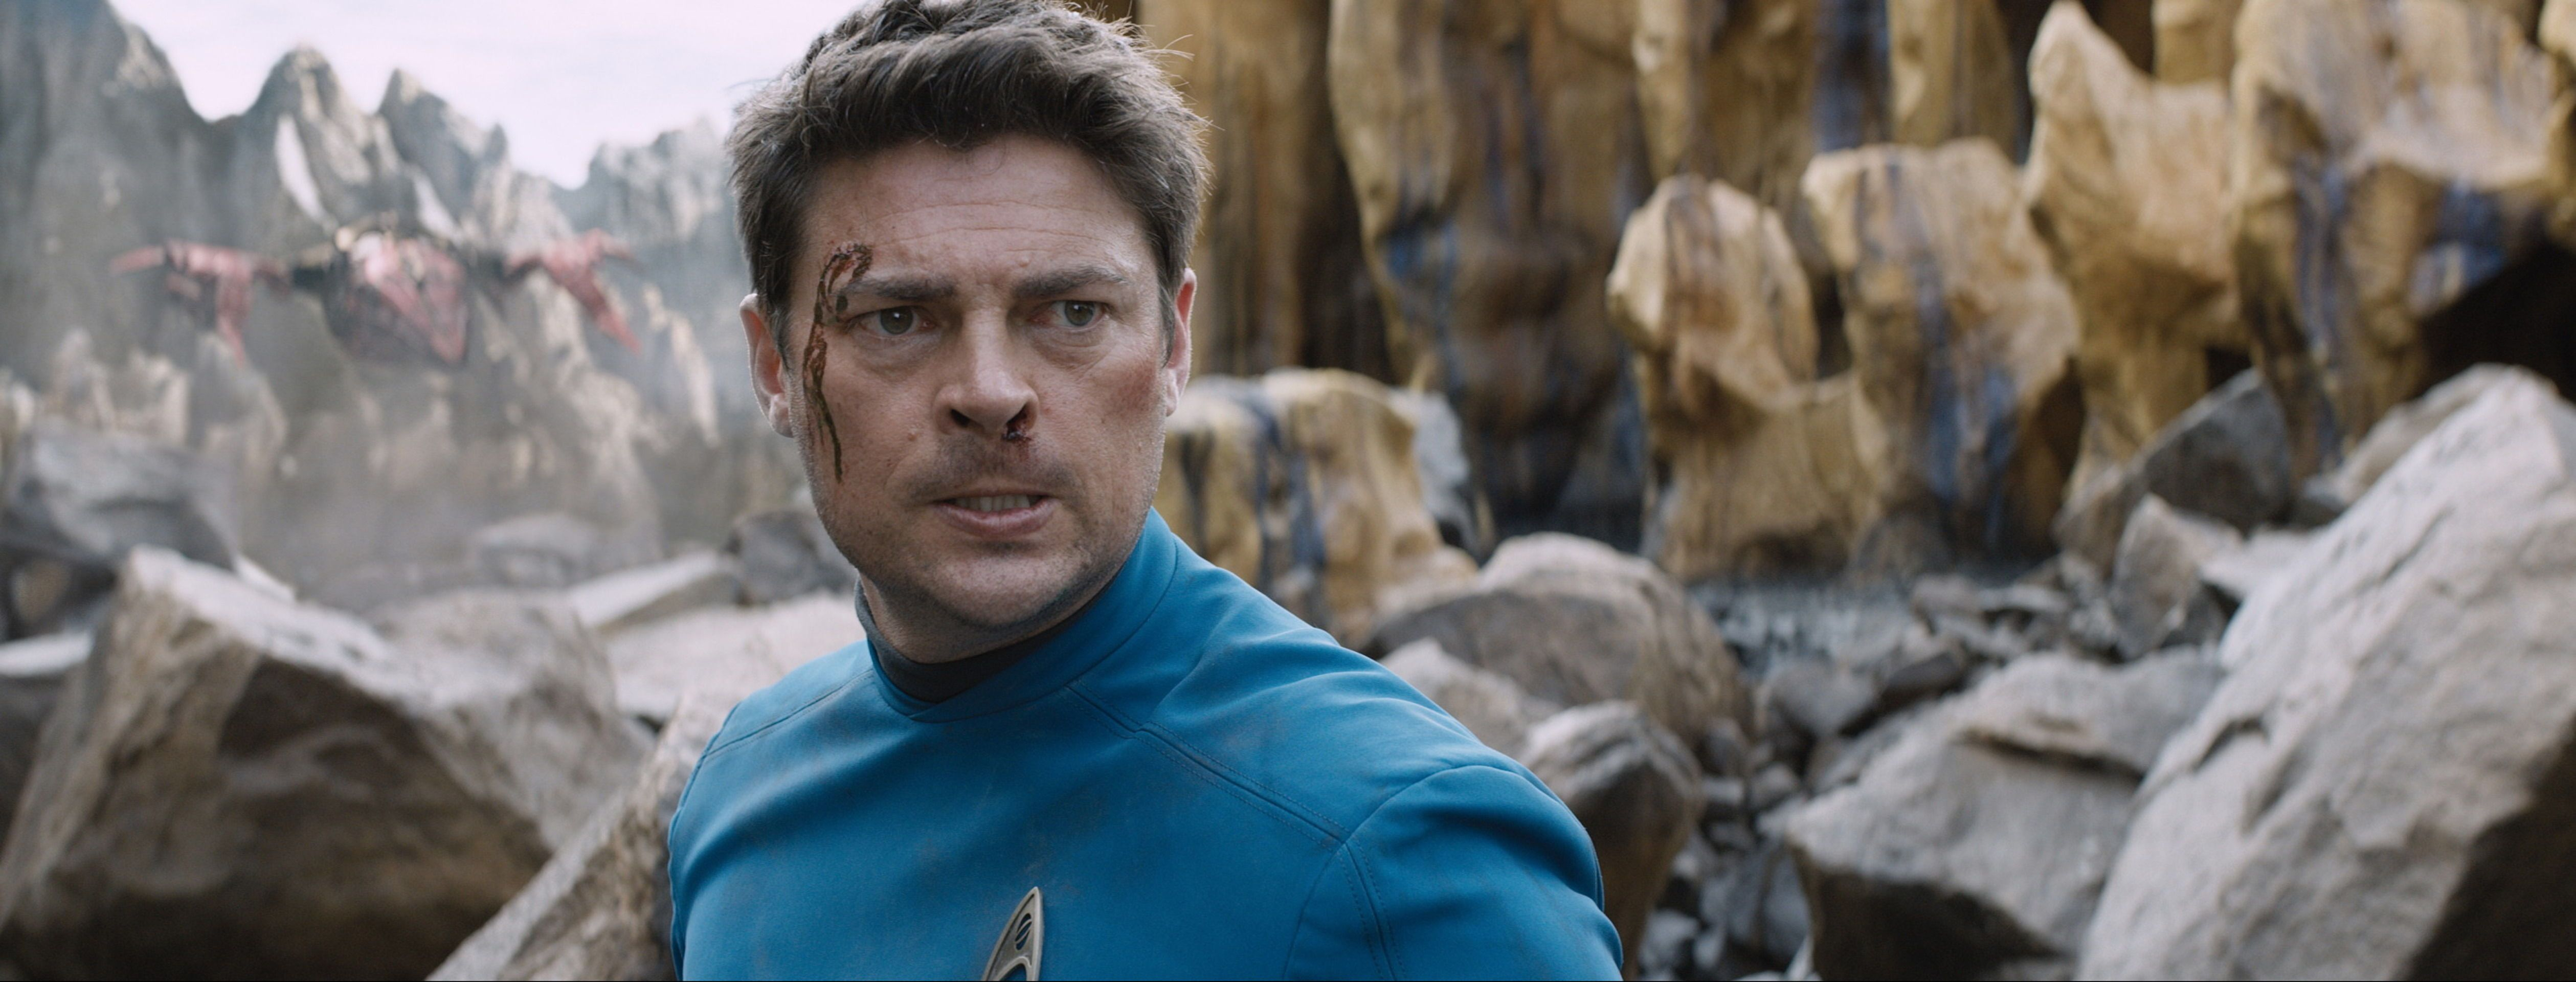 Star Trek 3: Justin Lin Convinced Karl Urban To Return